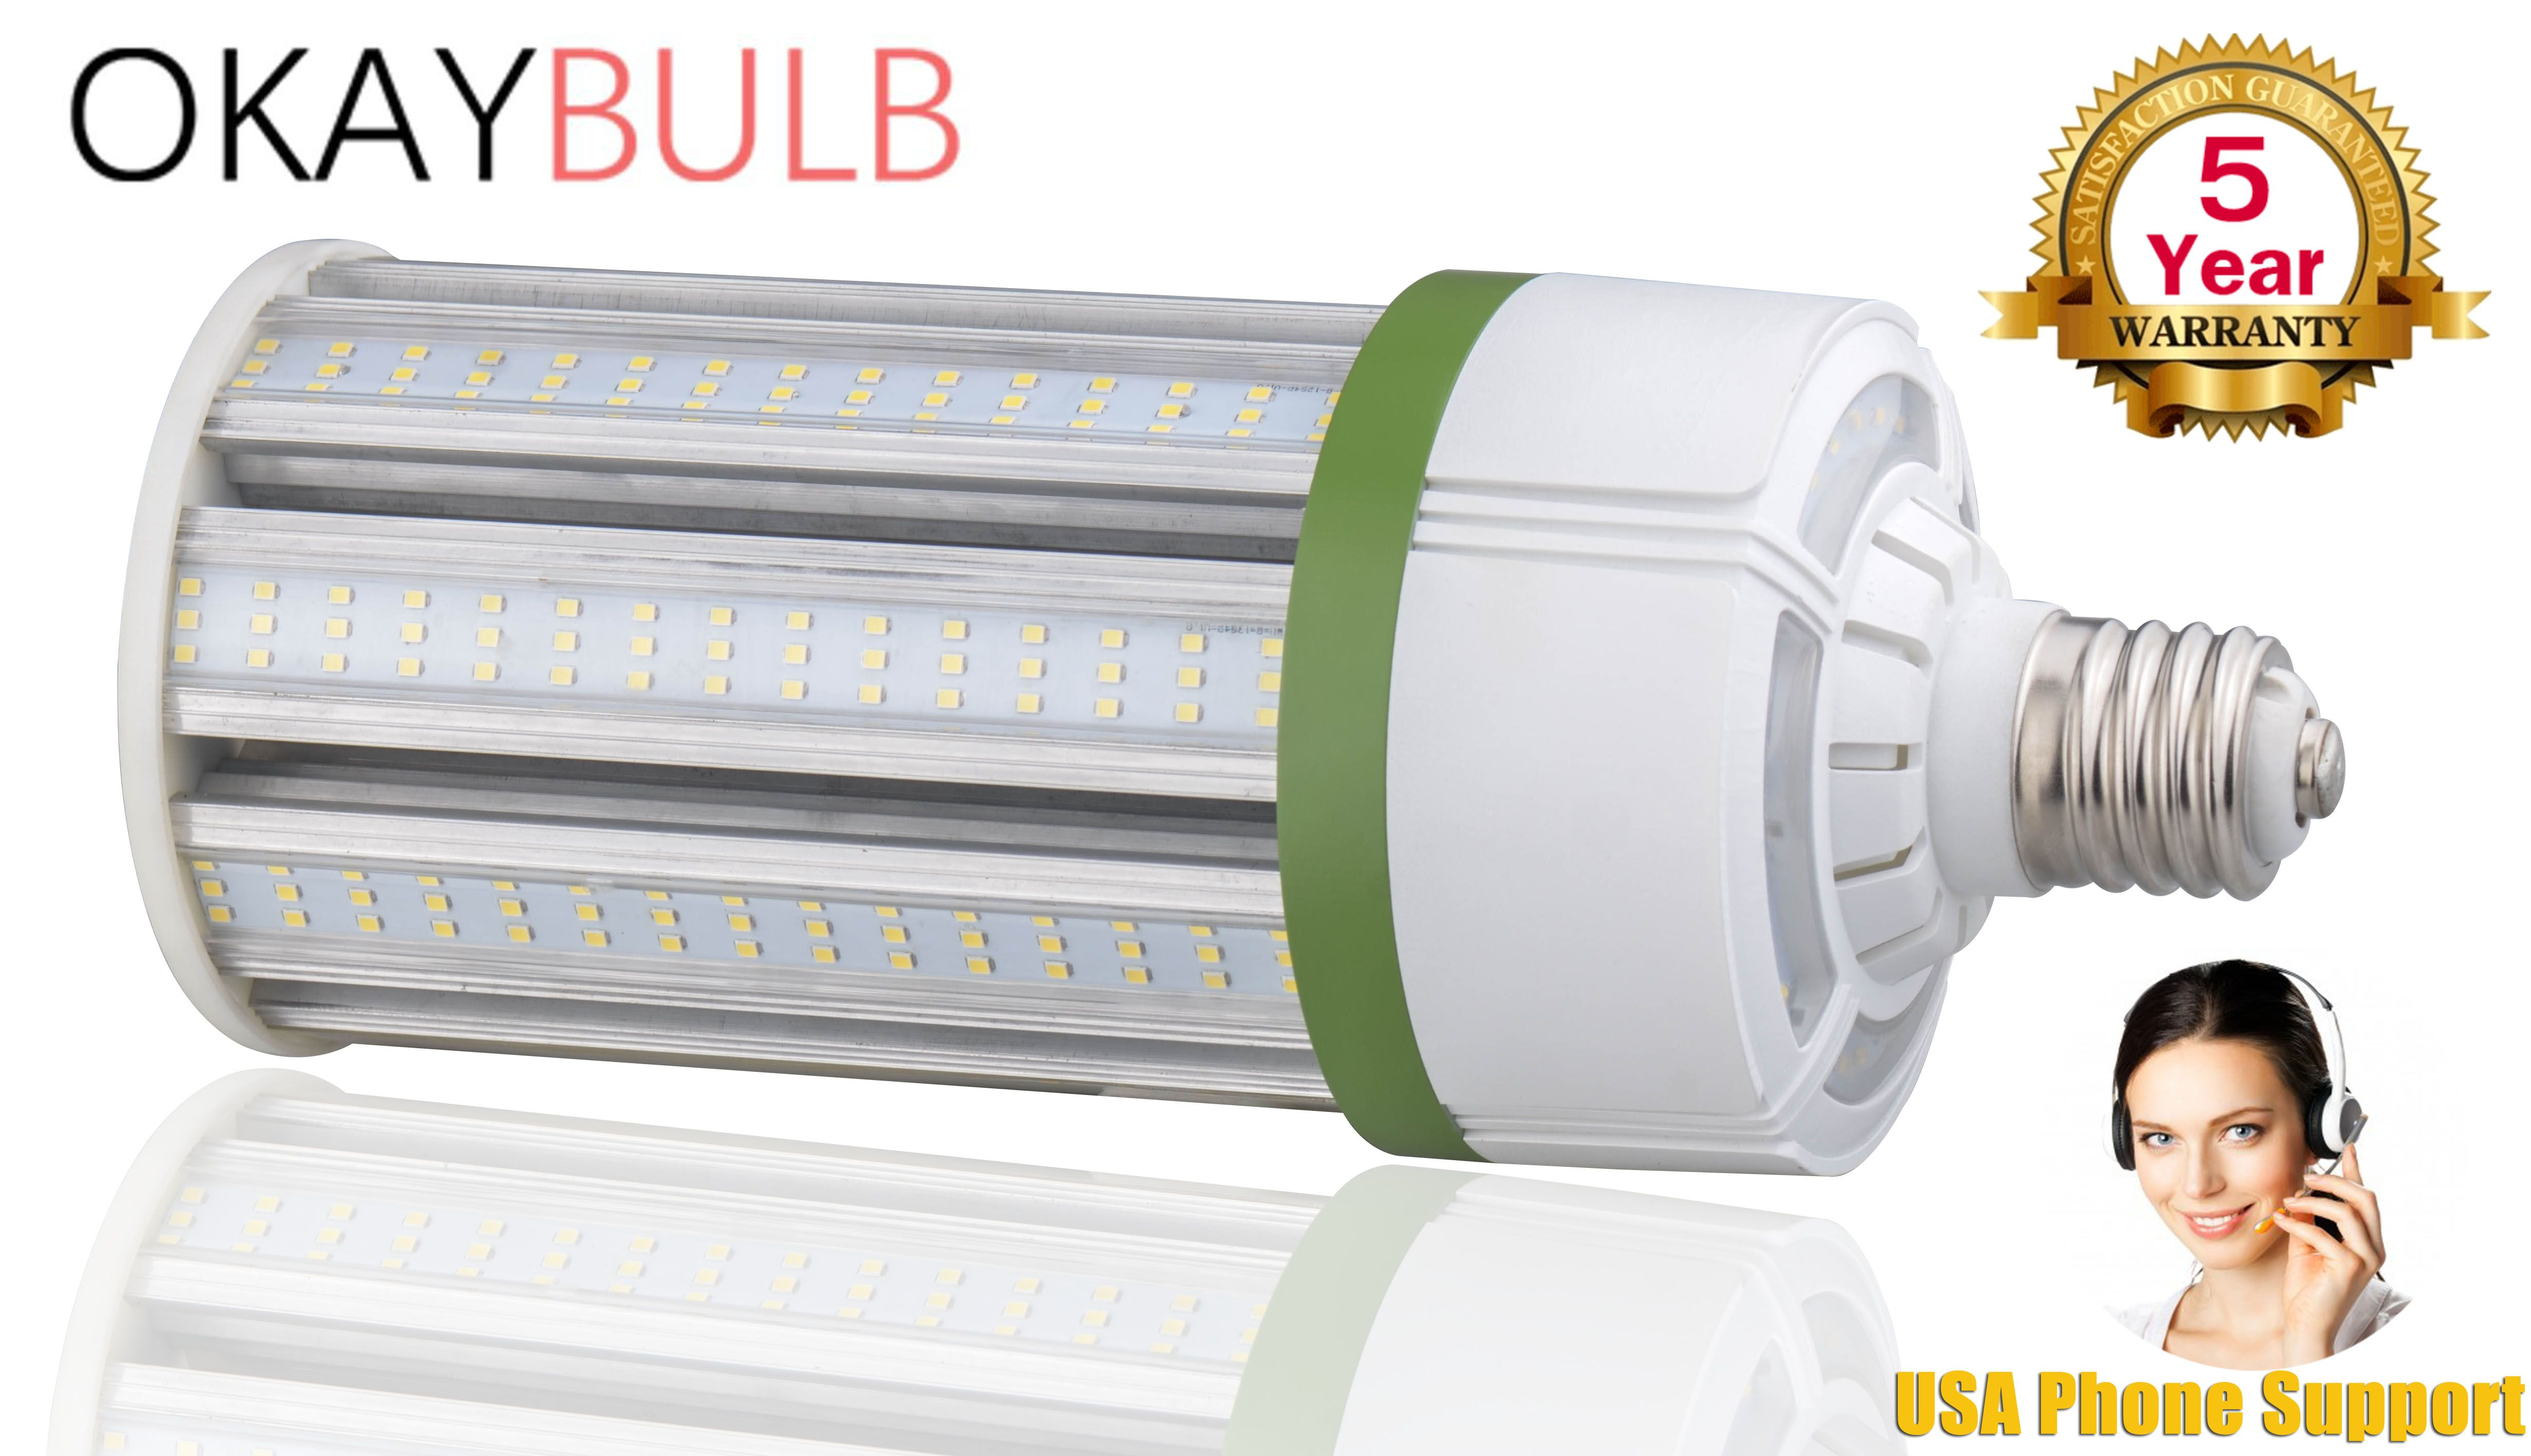 Metal Halide Led Replacement 150w Corn Light Bulb Okaybulb Bulb Light Bulb 150w